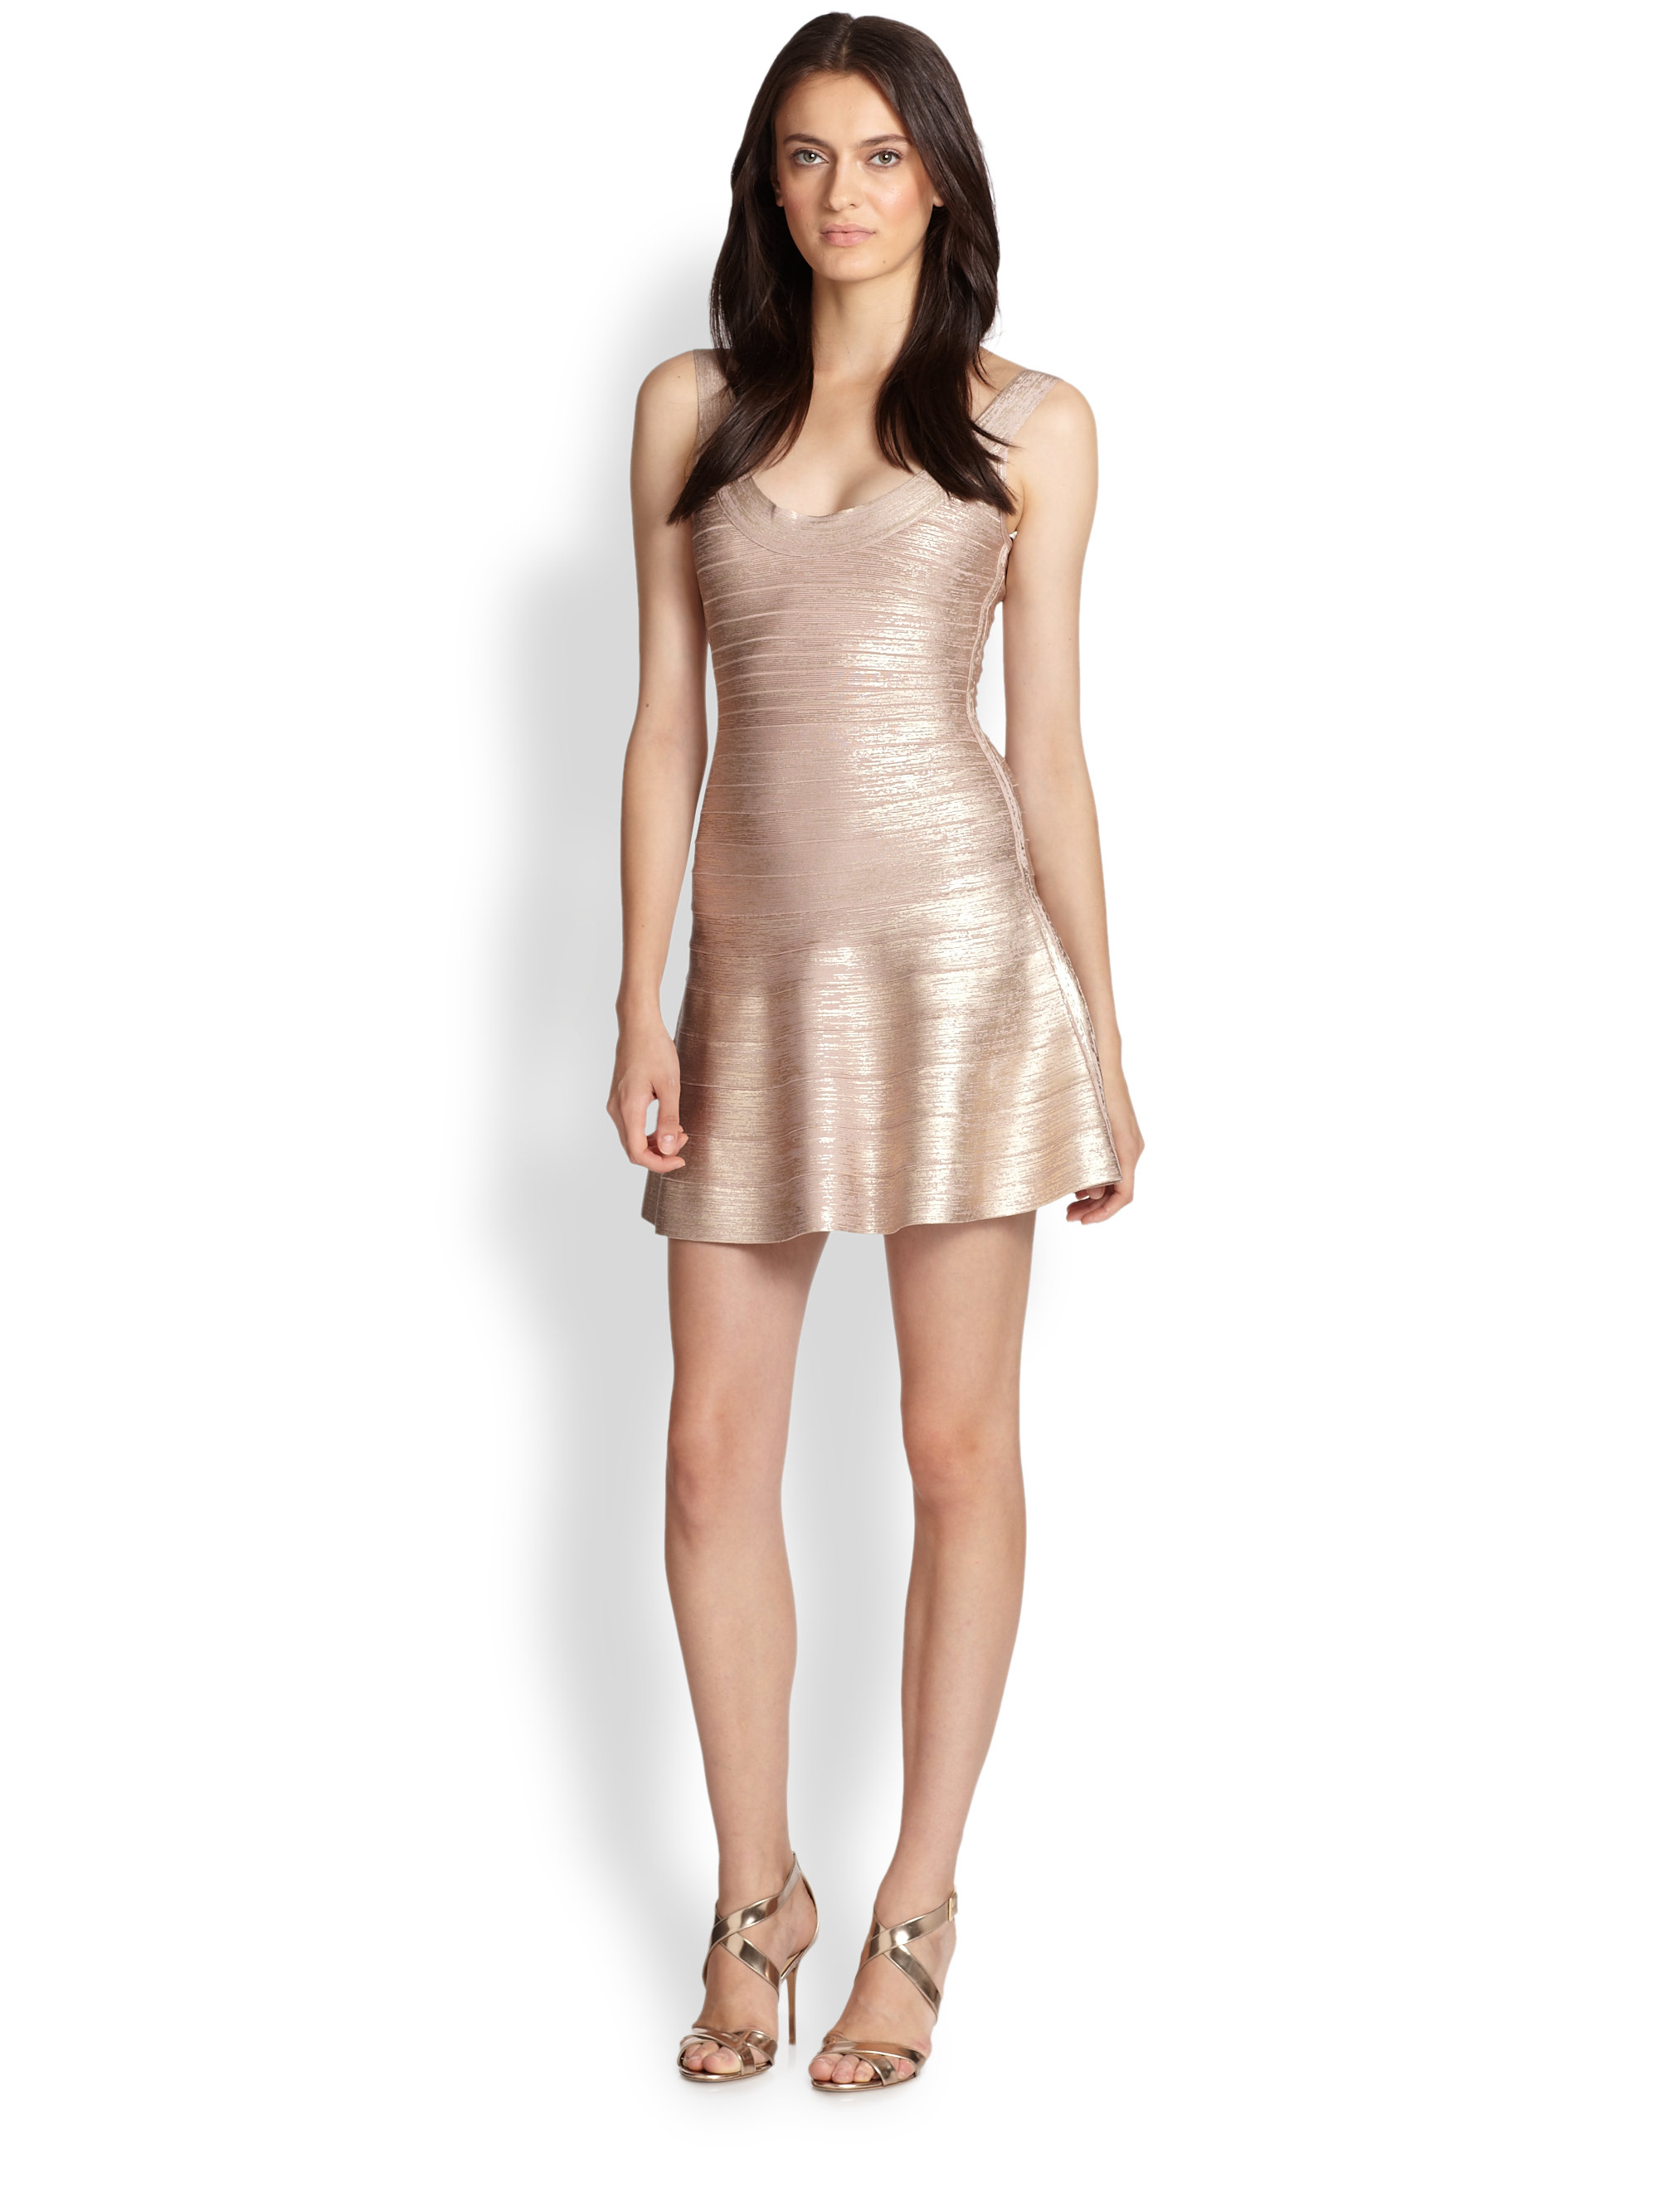 2eddd8c8ed95 Hervé Léger Eva Flared Metallic Bandage Dress in Pink - Lyst